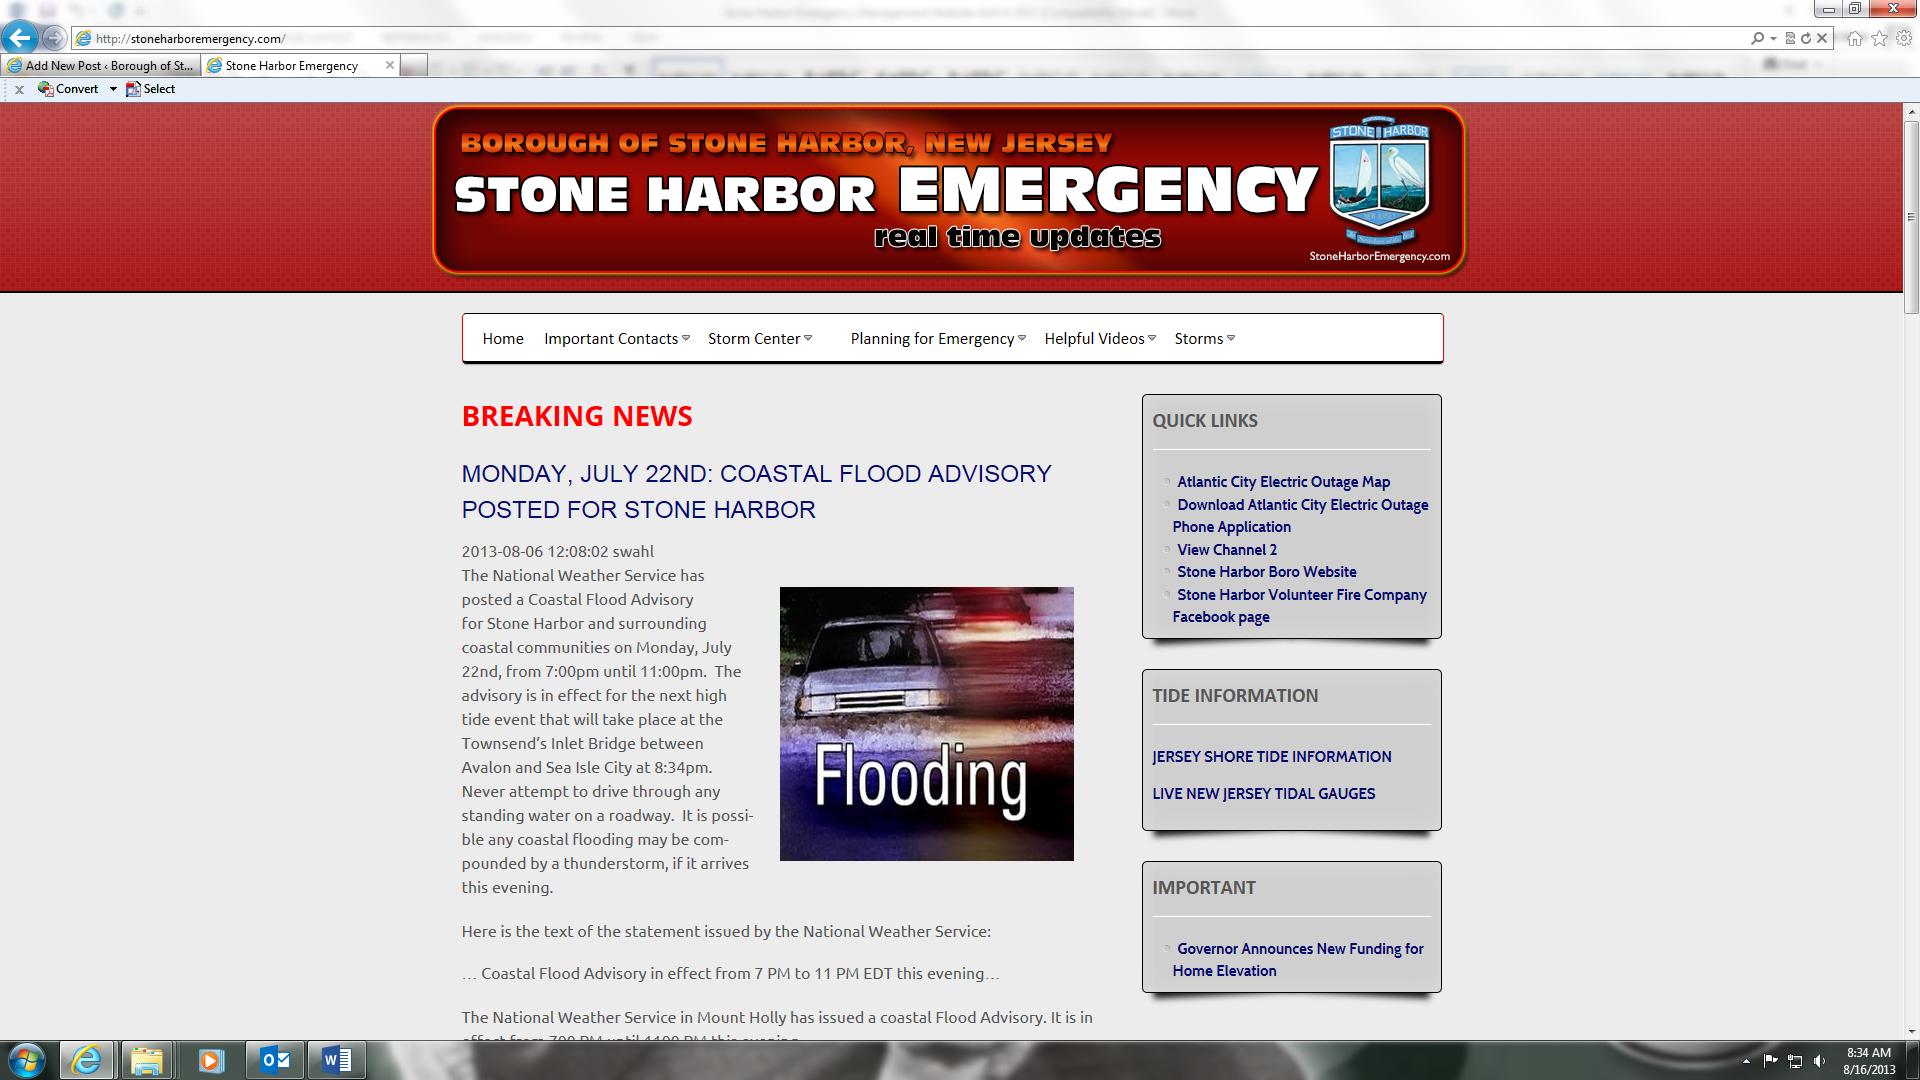 Borough Launches New Emergency Website, www